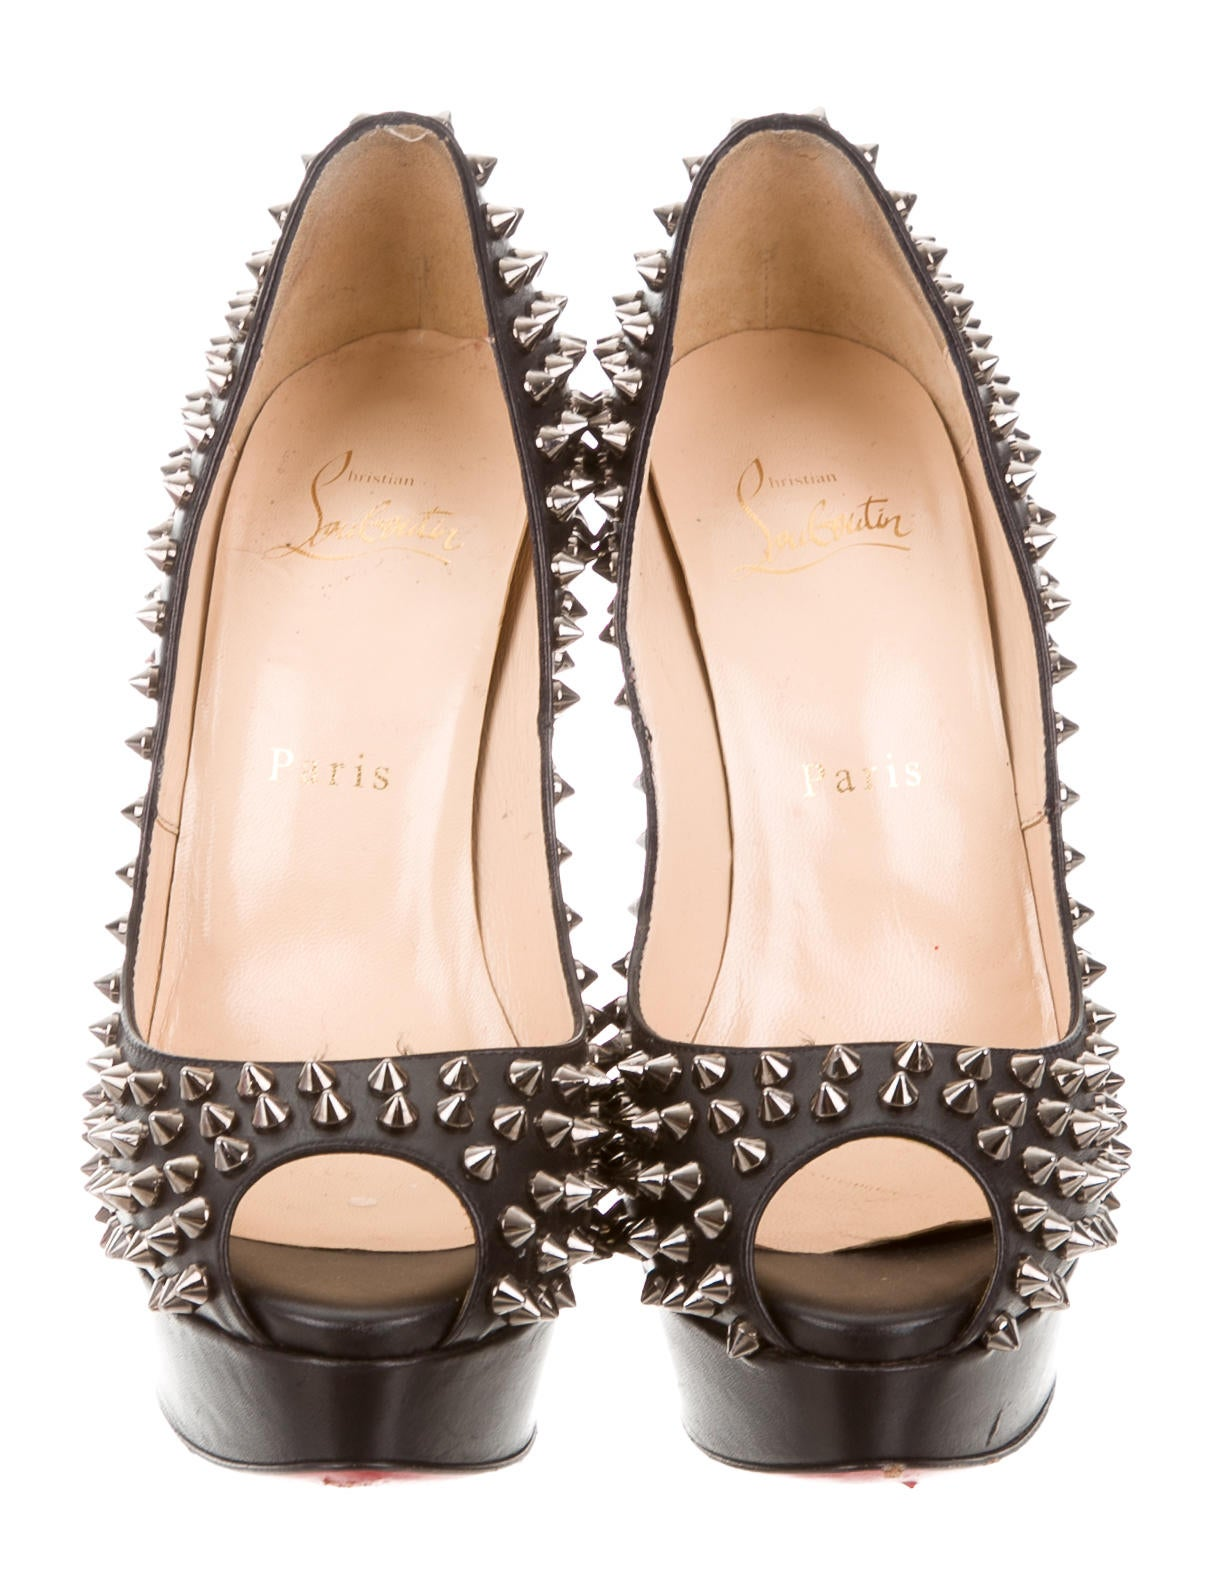 christian louboutin spiked platform pumps shoes